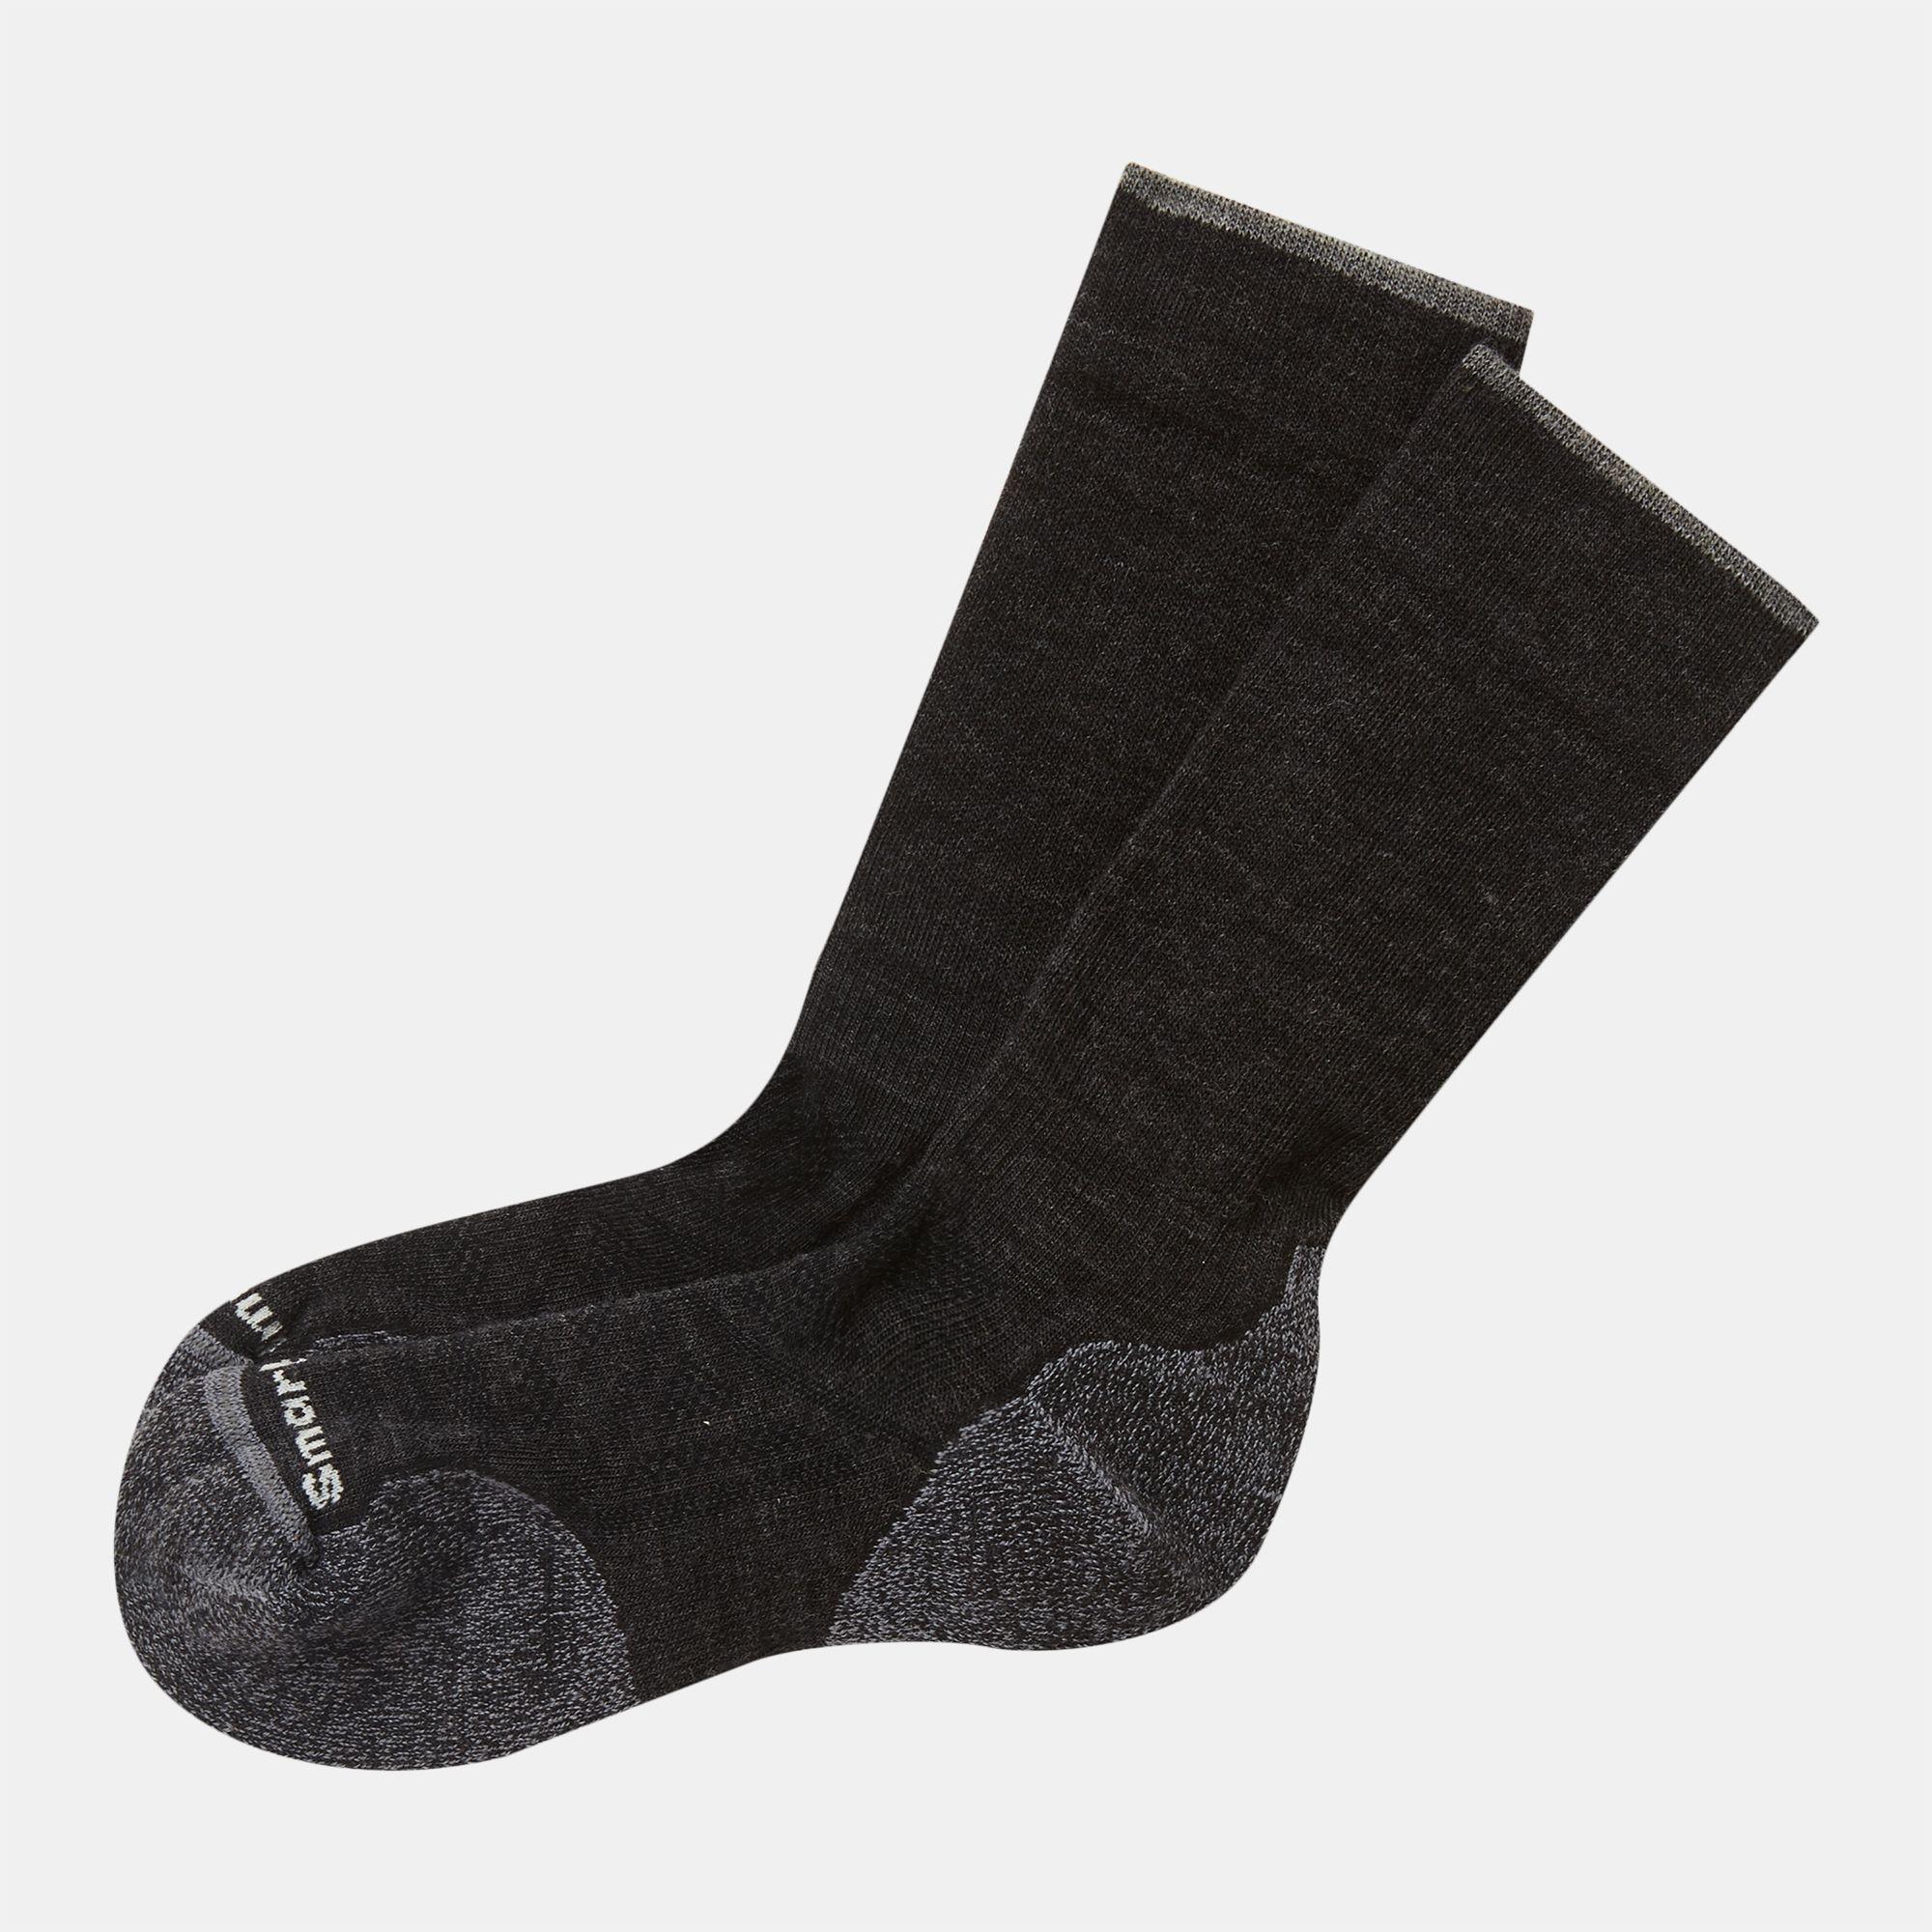 Smartwool phd outdoor light crew socks crew socks socks smartwool phd outdoor light crew socks aloadofball Image collections